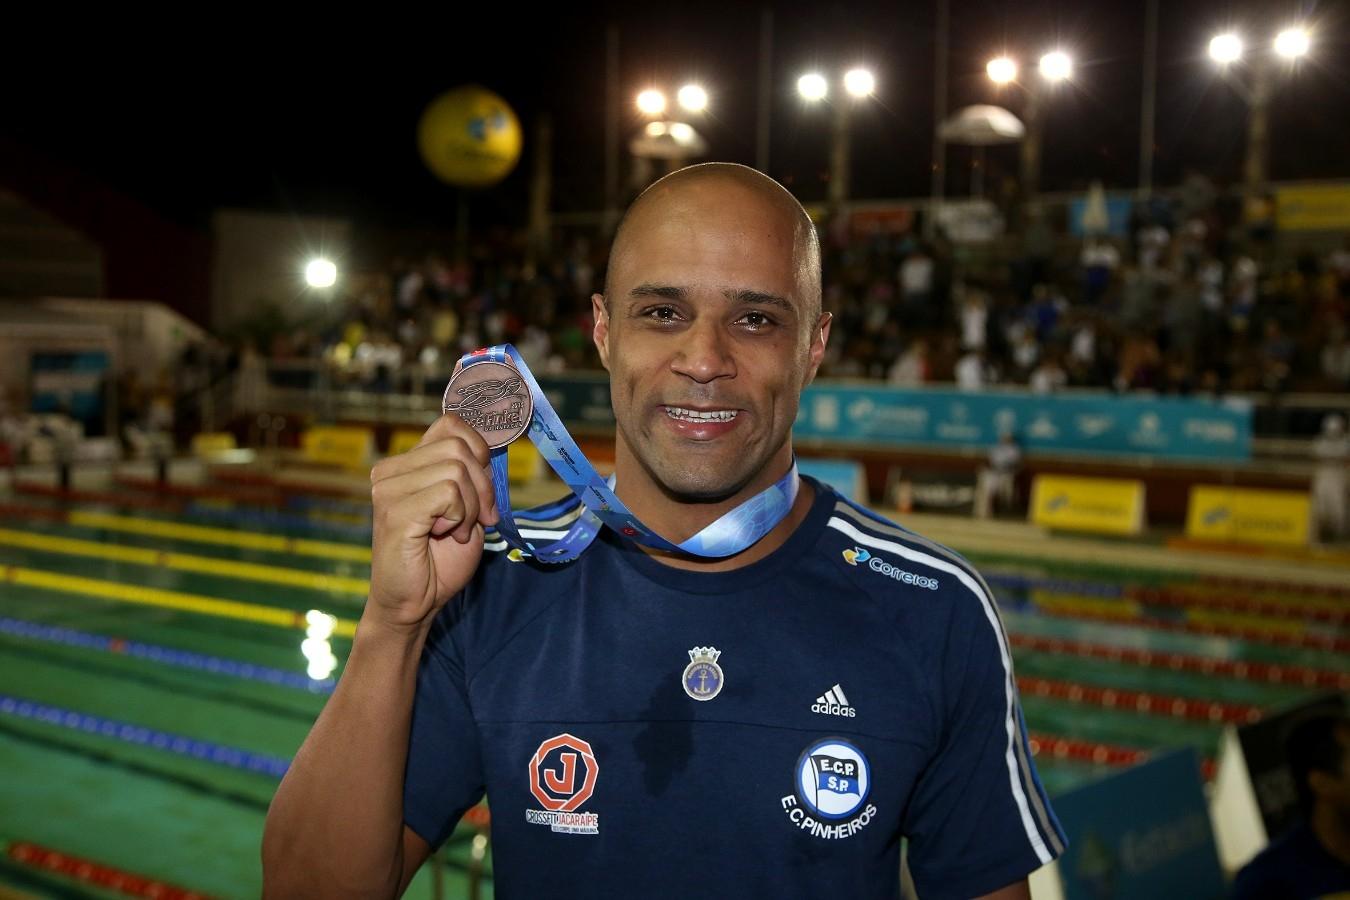 Joao Gomes - Trofeu Jose Finkel de Natacao no Clube Internacional de Regatas. 15 de Setembro de 2016, Santos, SP, Brasil. Foto:Satiro Sodré/SSPress.